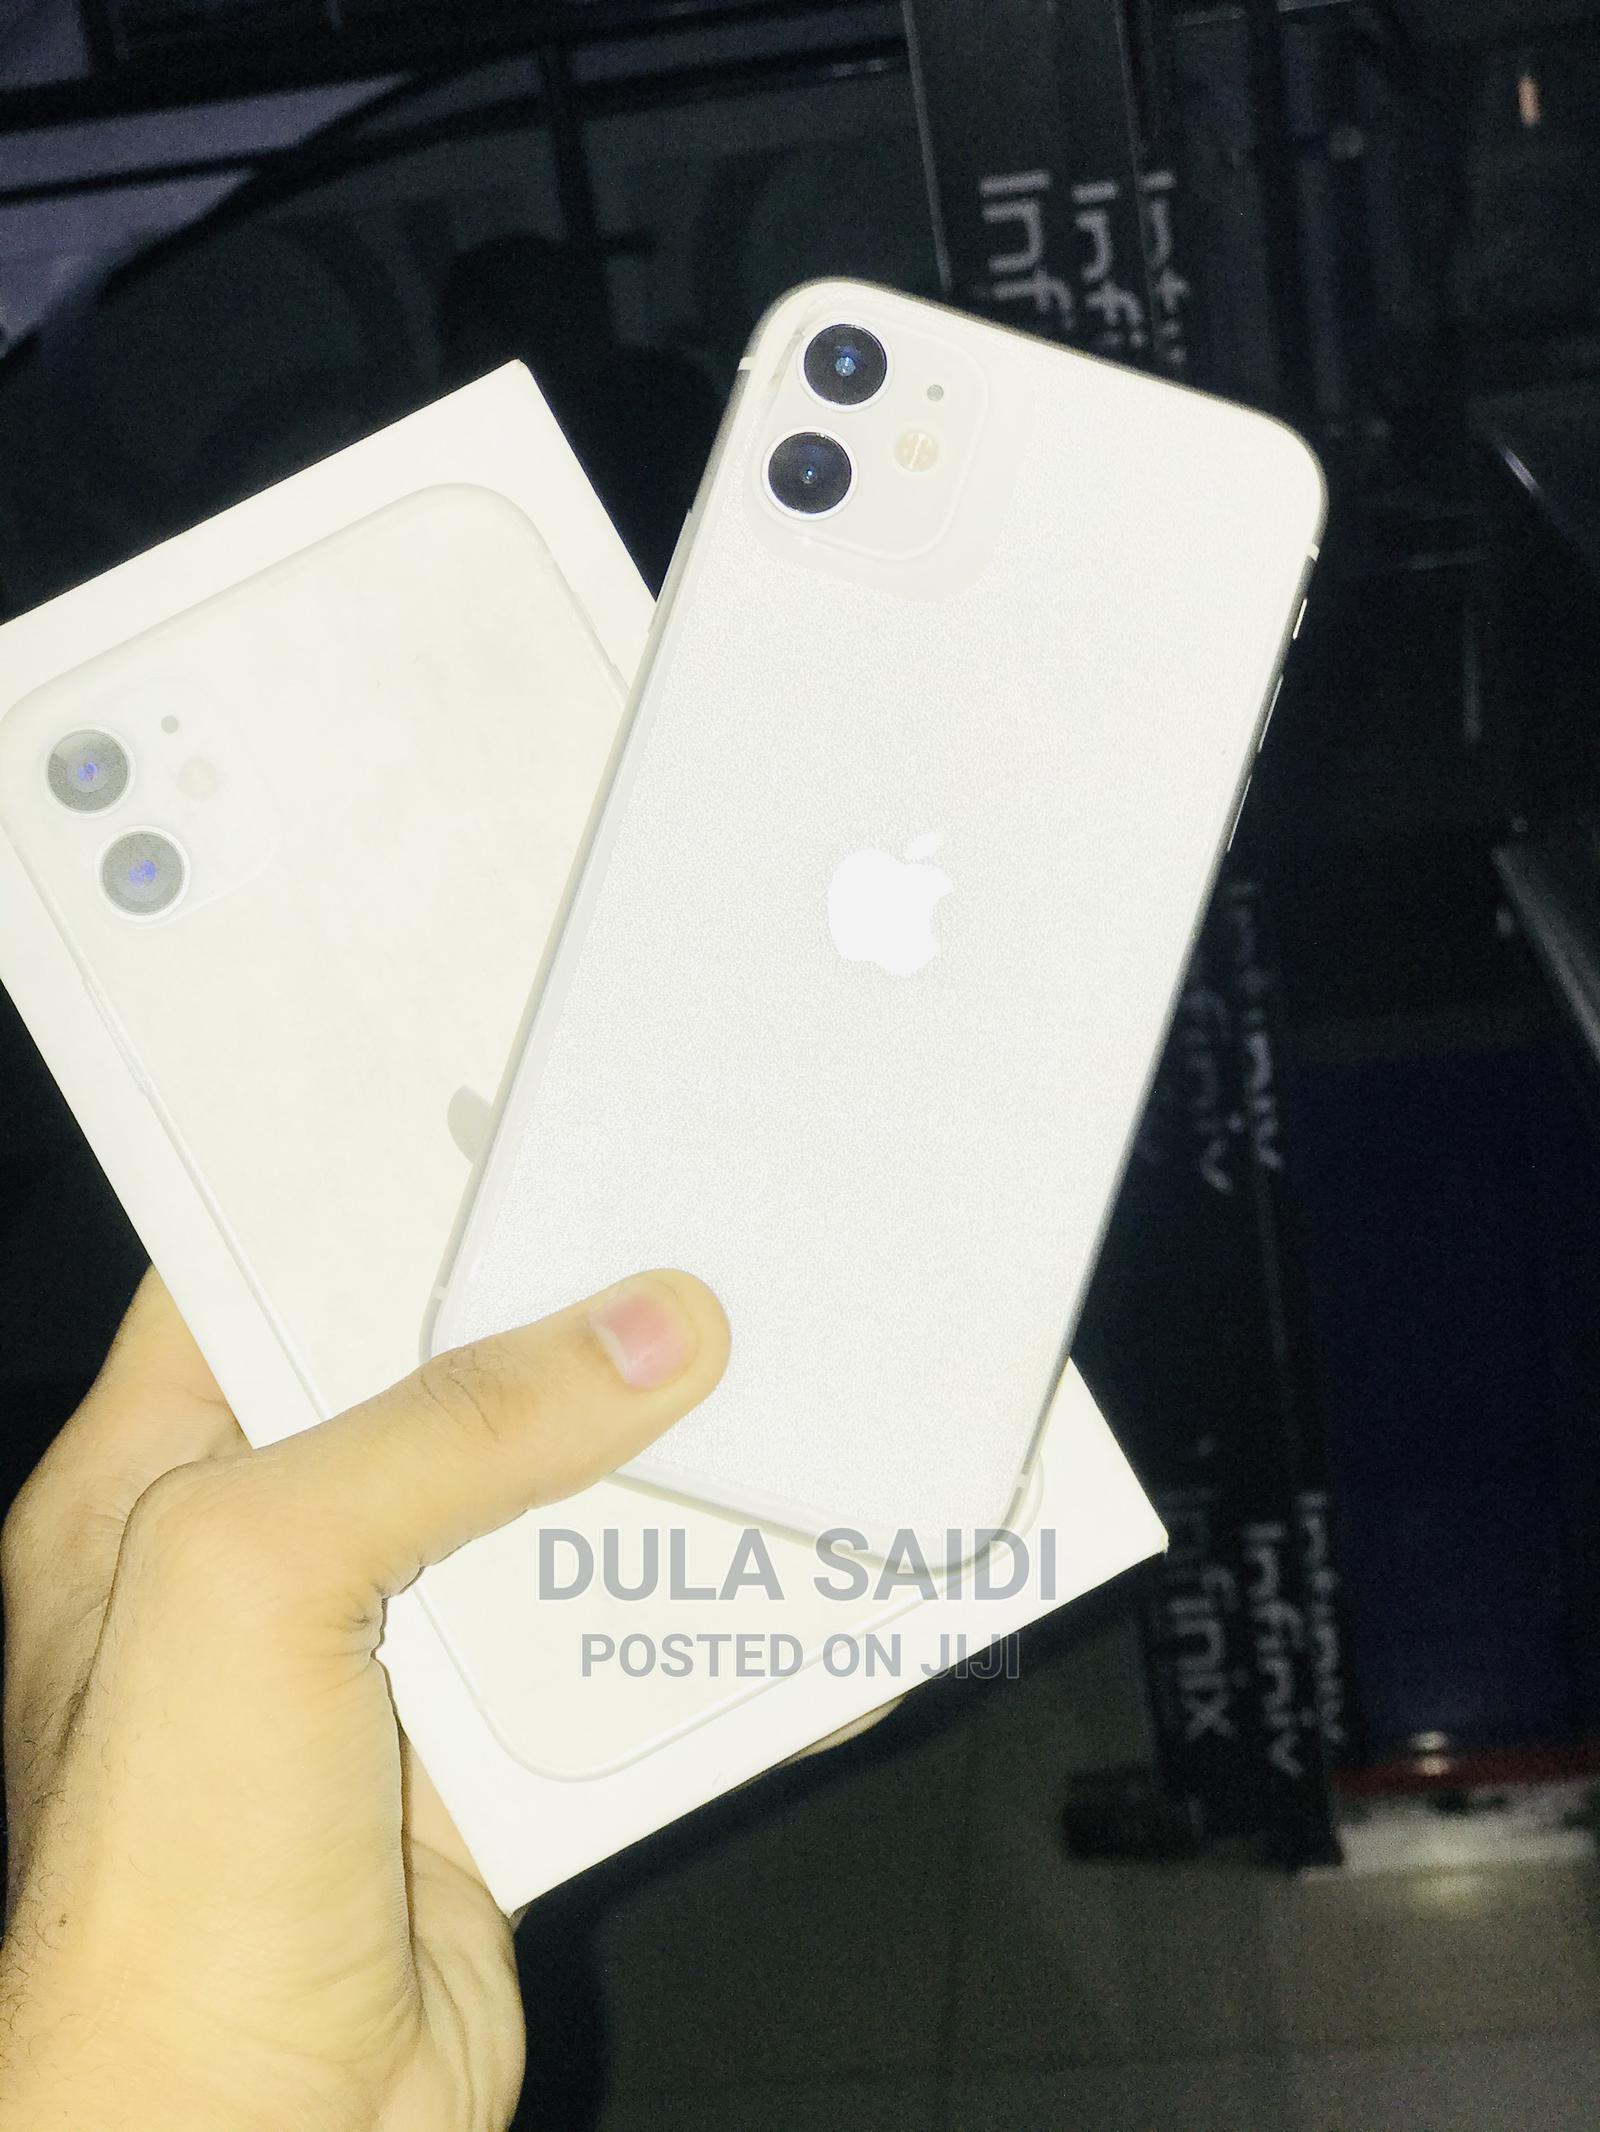 Apple iPhone 11 128 GB White | Mobile Phones for sale in Ilala, Dar es Salaam, Tanzania